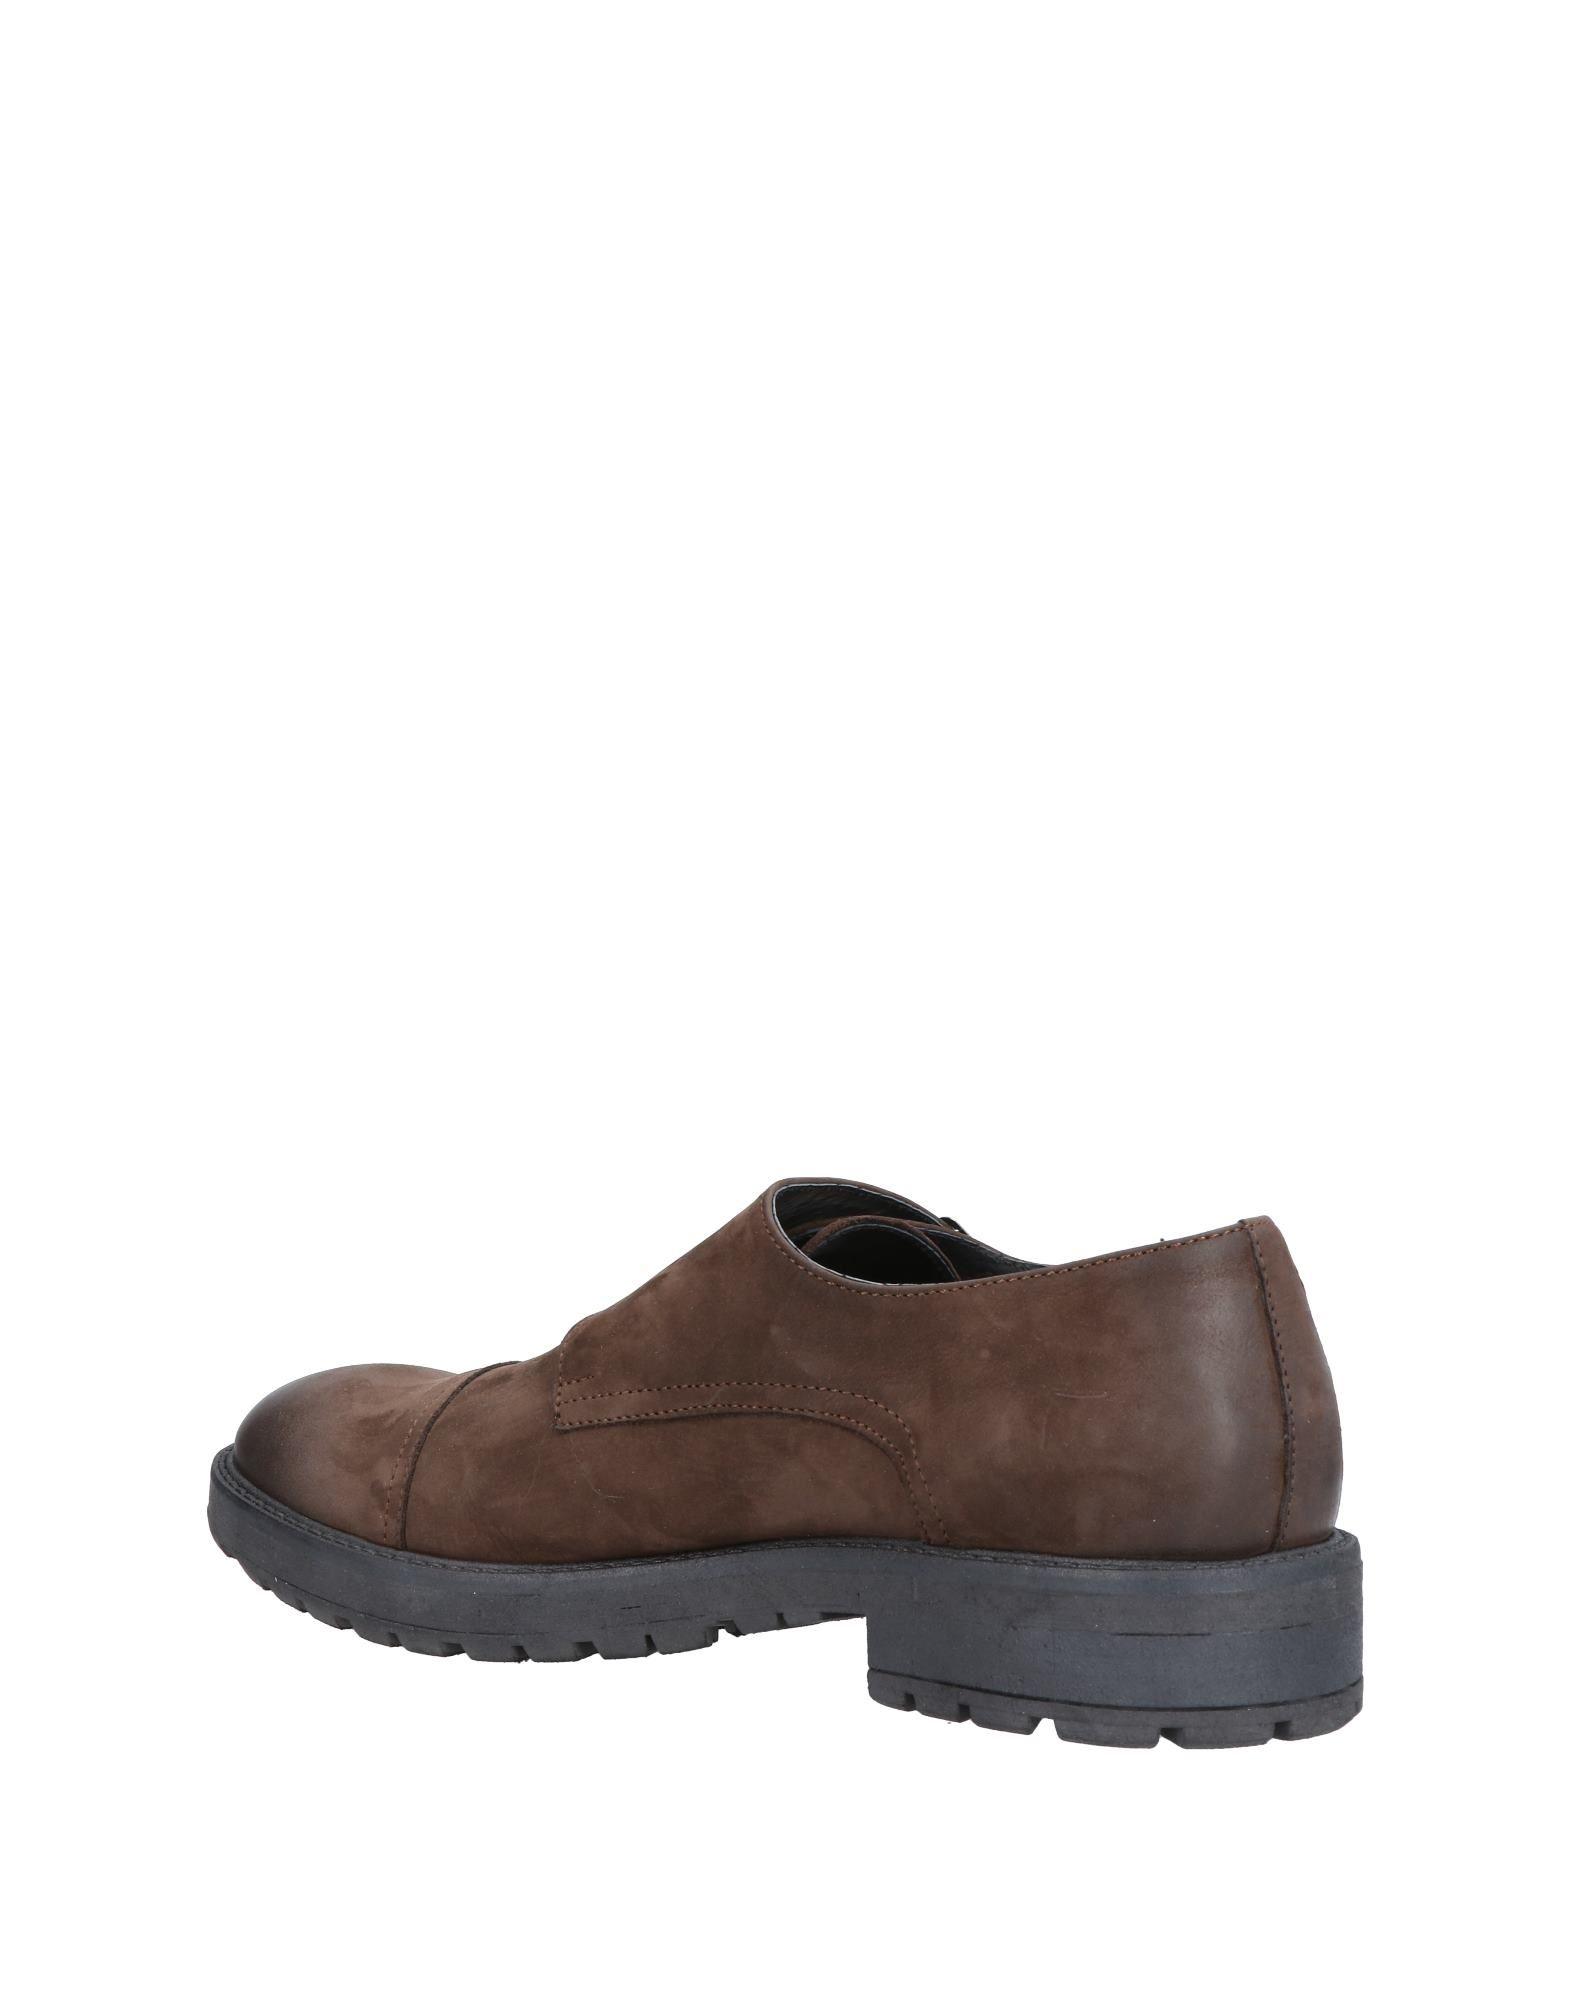 Rabatt Exibit echte Schuhe Exibit Rabatt Mokassins Herren  11465325OL 0228c0